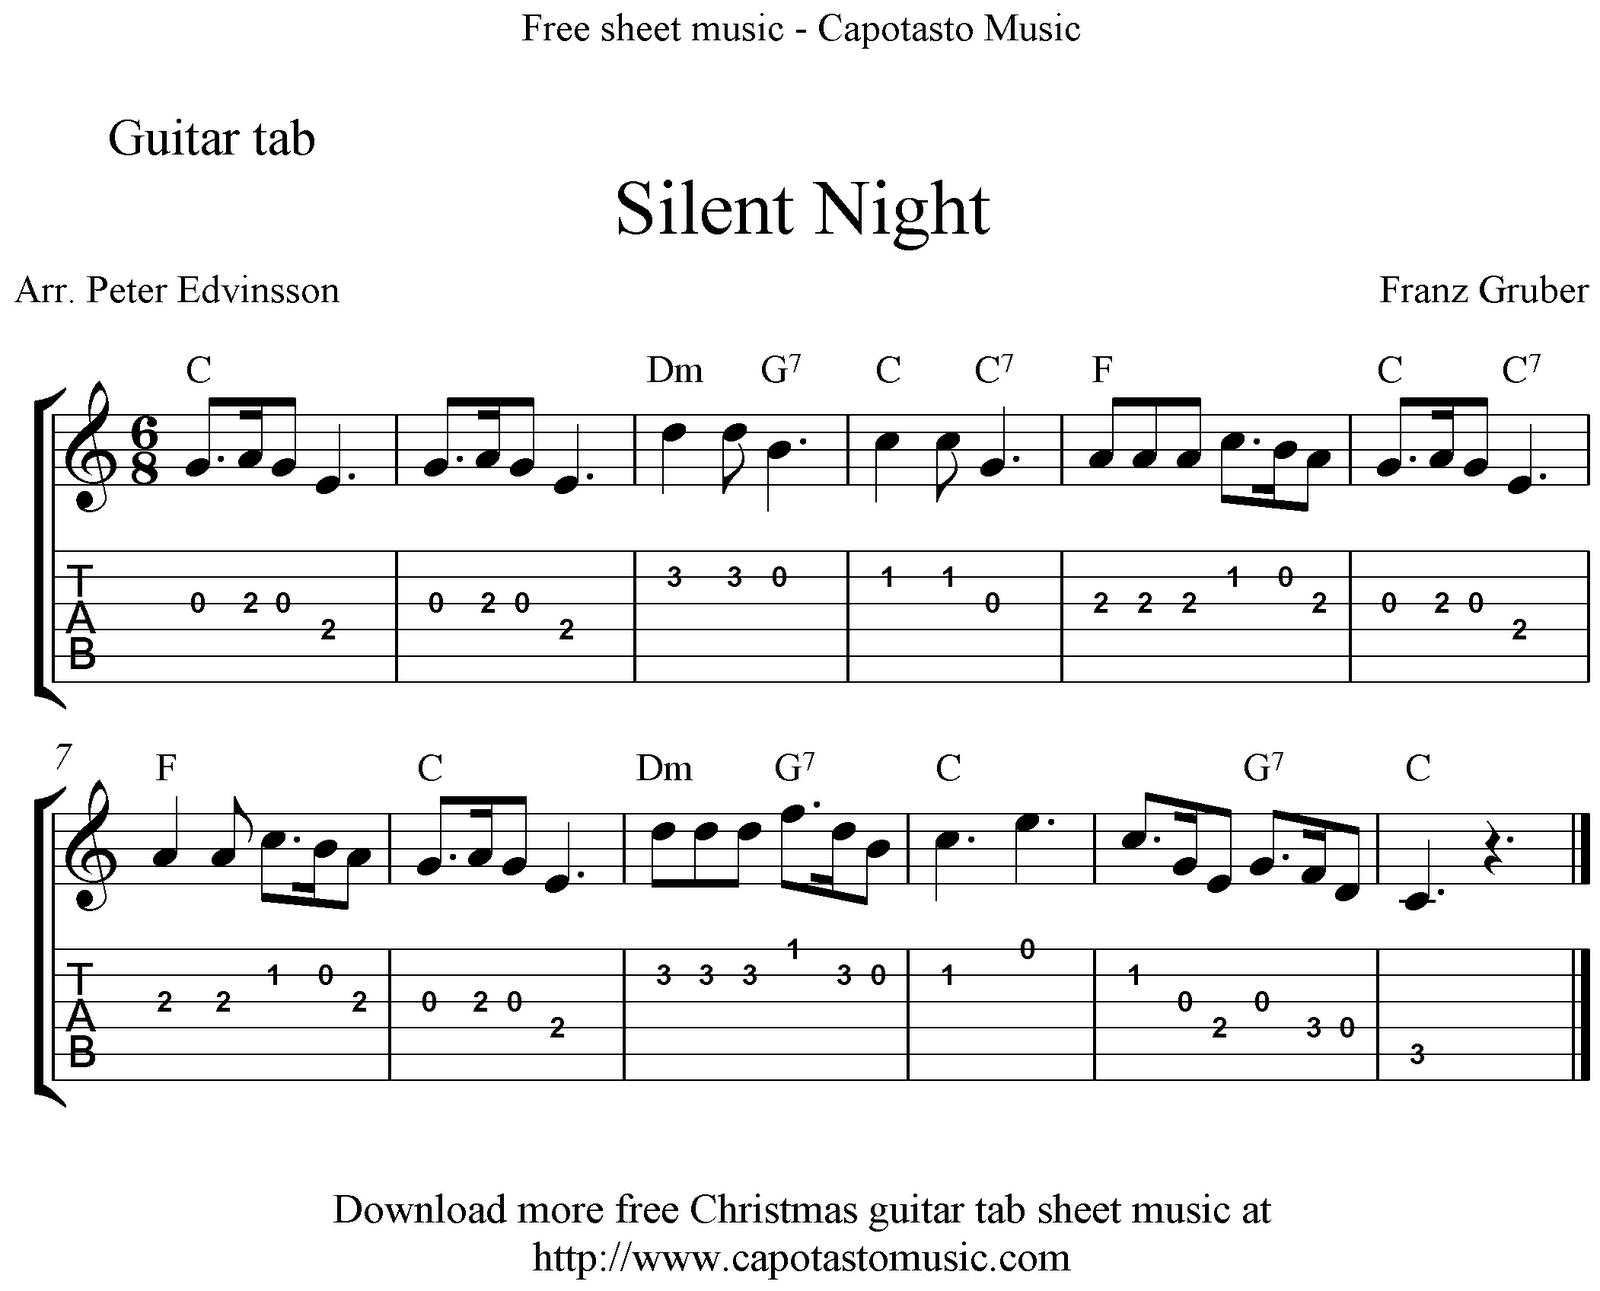 Christmas Guitar Tabs.Silent Night Easy Free Christmas Guitar Tab Sheet Music